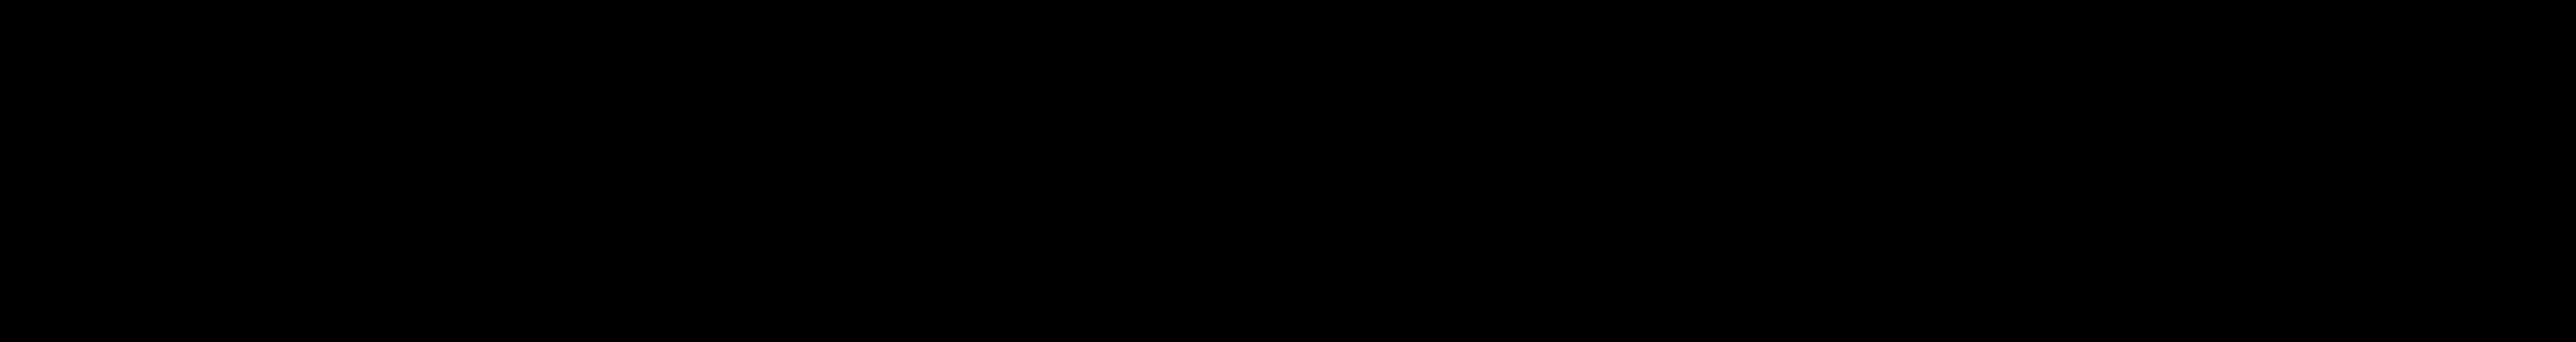 wp-content/uploads/img-loghi11/FuseFactory_logo.png